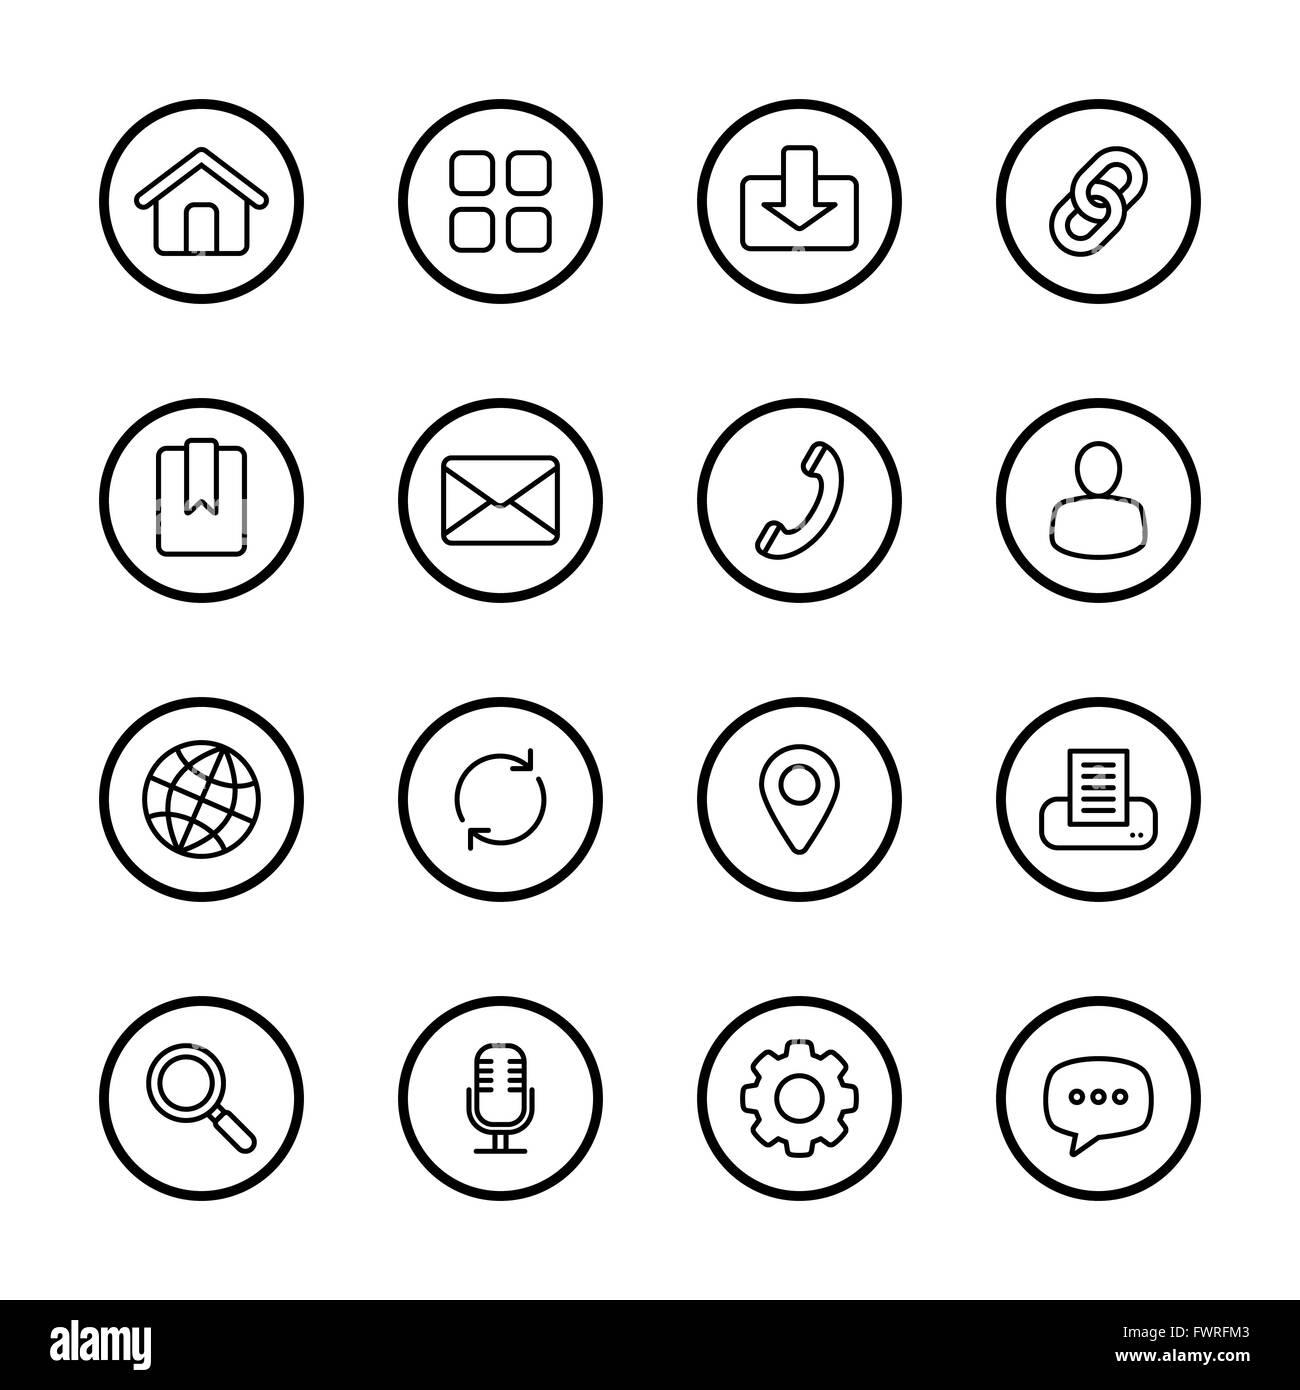 JPEG] black line web icon set with circle frame for web, UI Stock ...